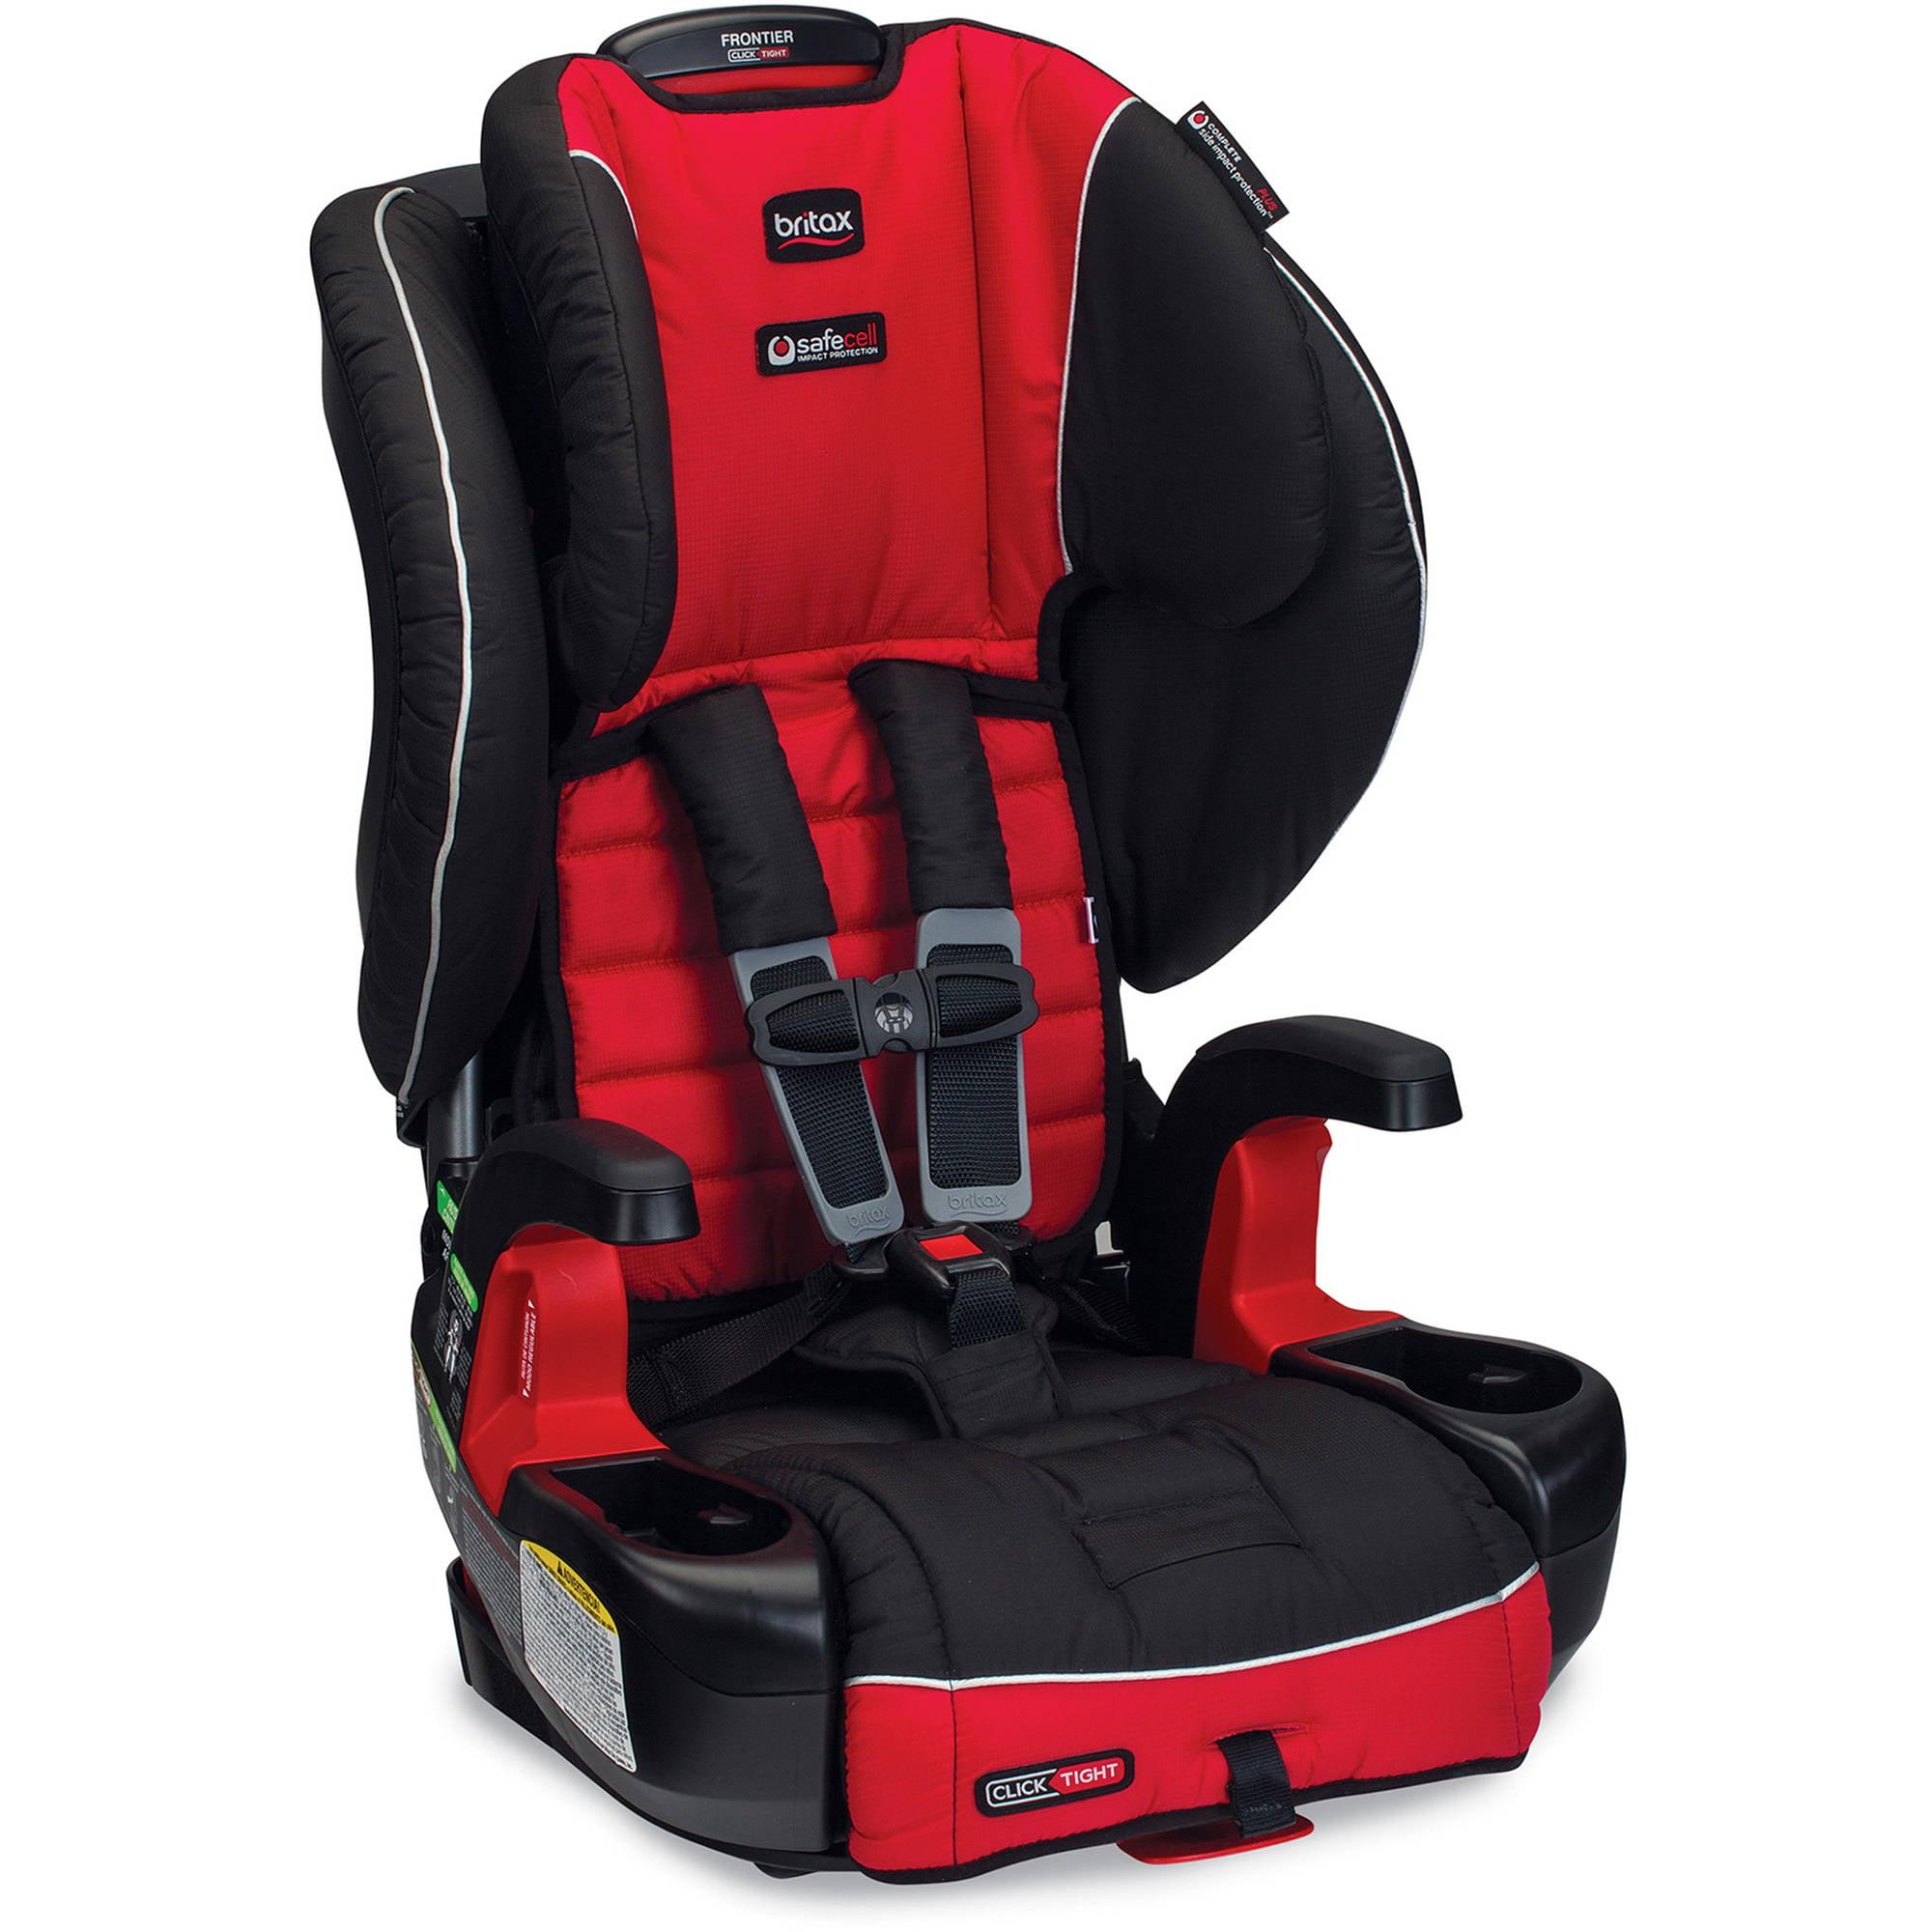 Britax Frontier G1.1 Clicktight Harness Booster Car Seat - Walmart.com